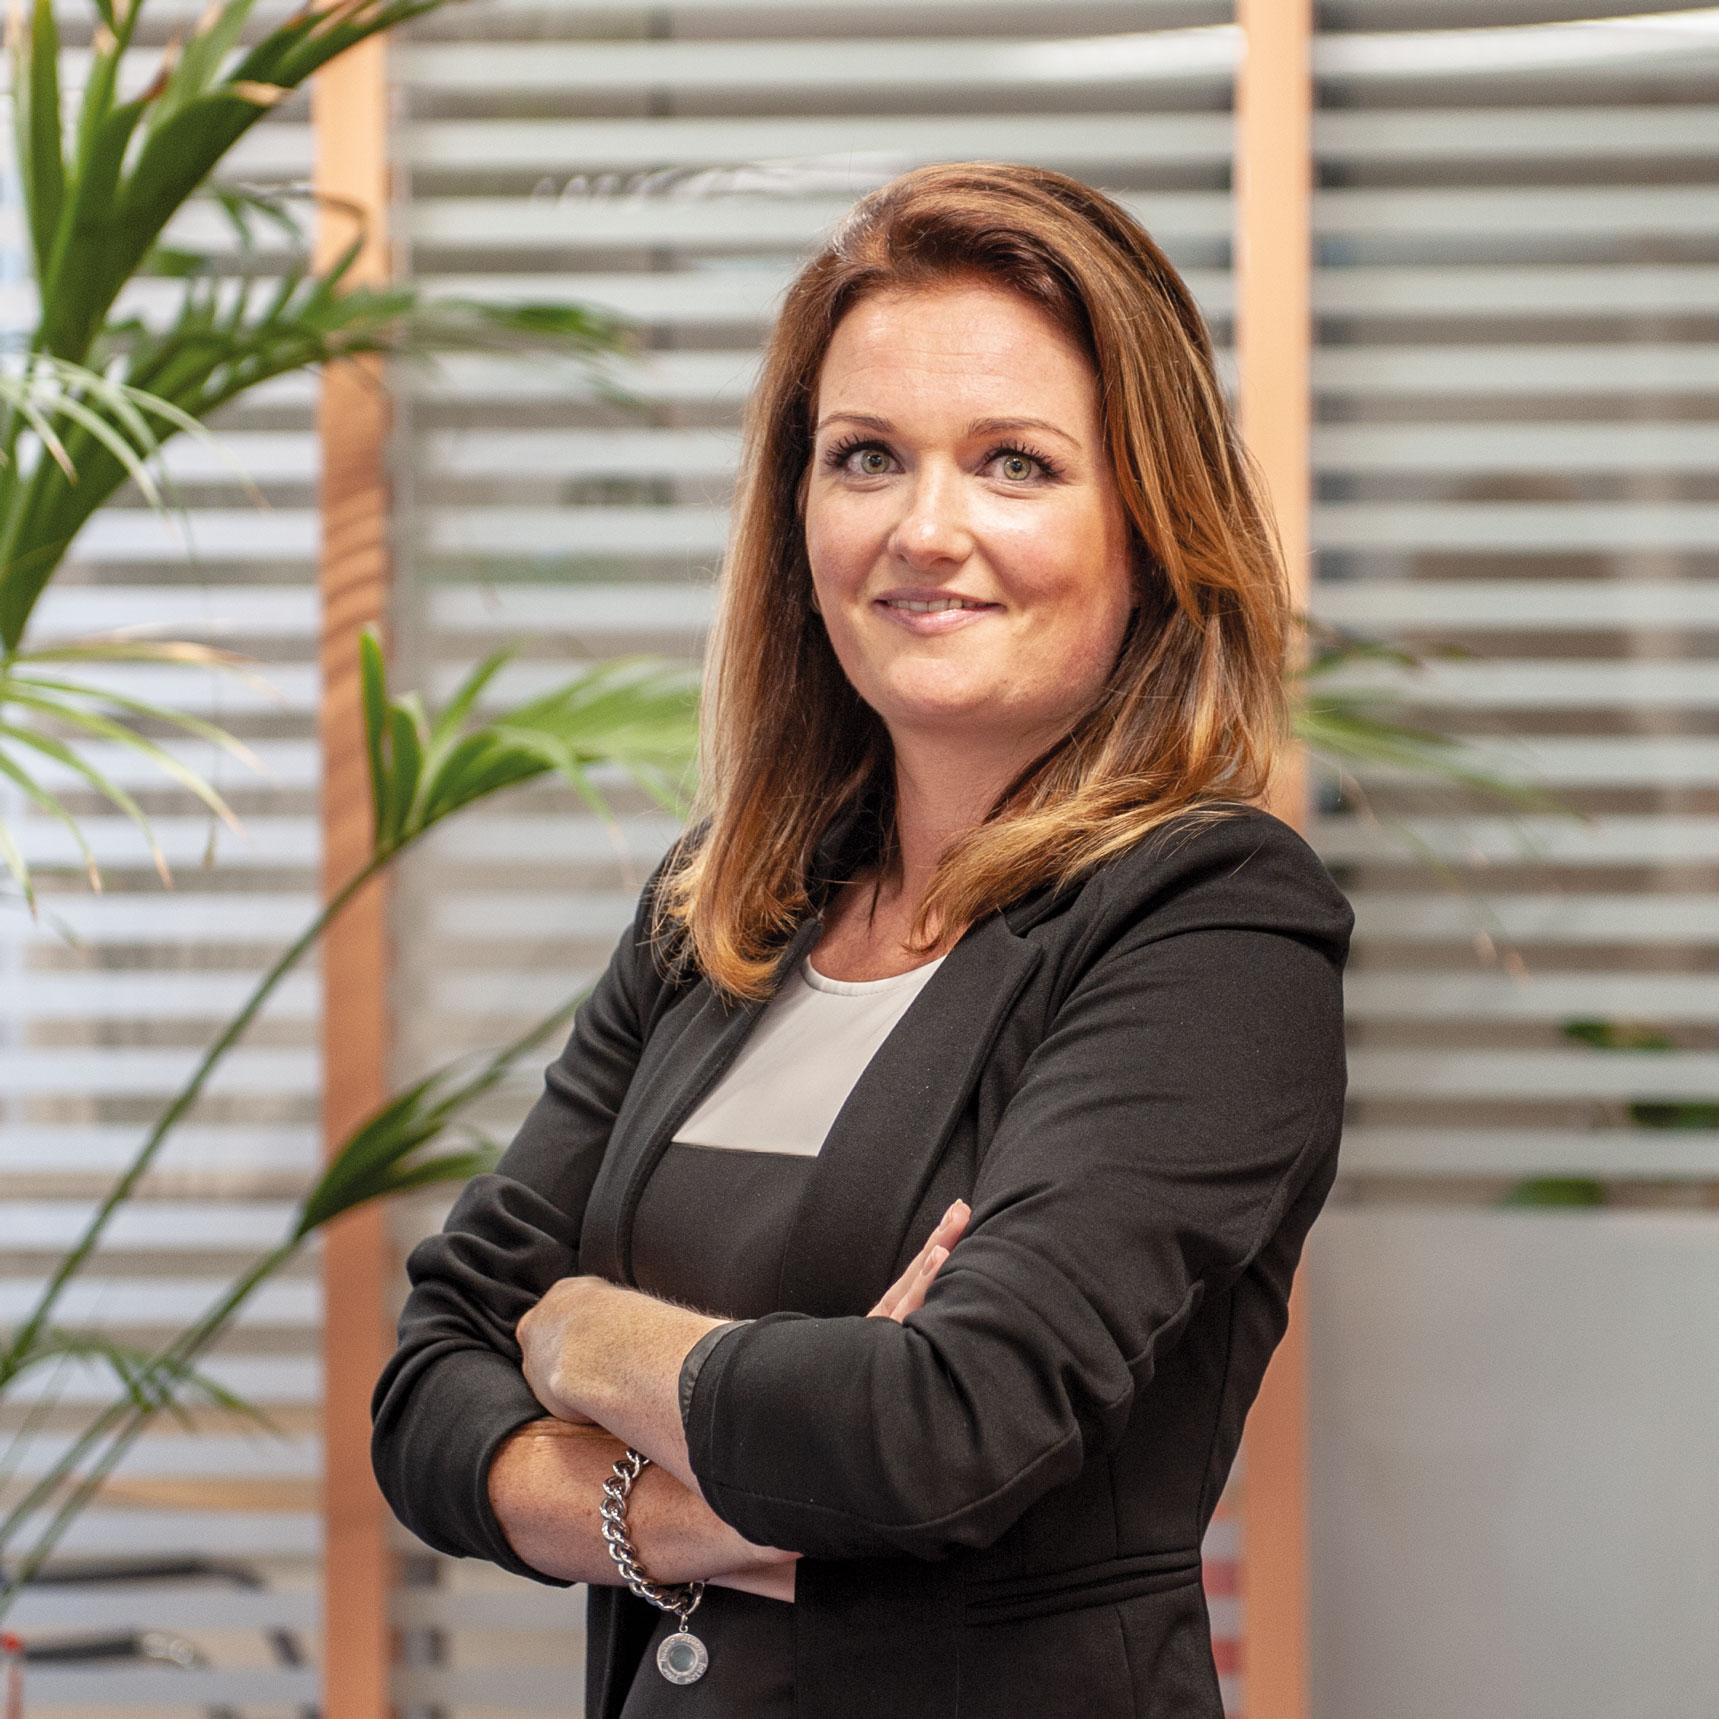 Suzan van den Brand